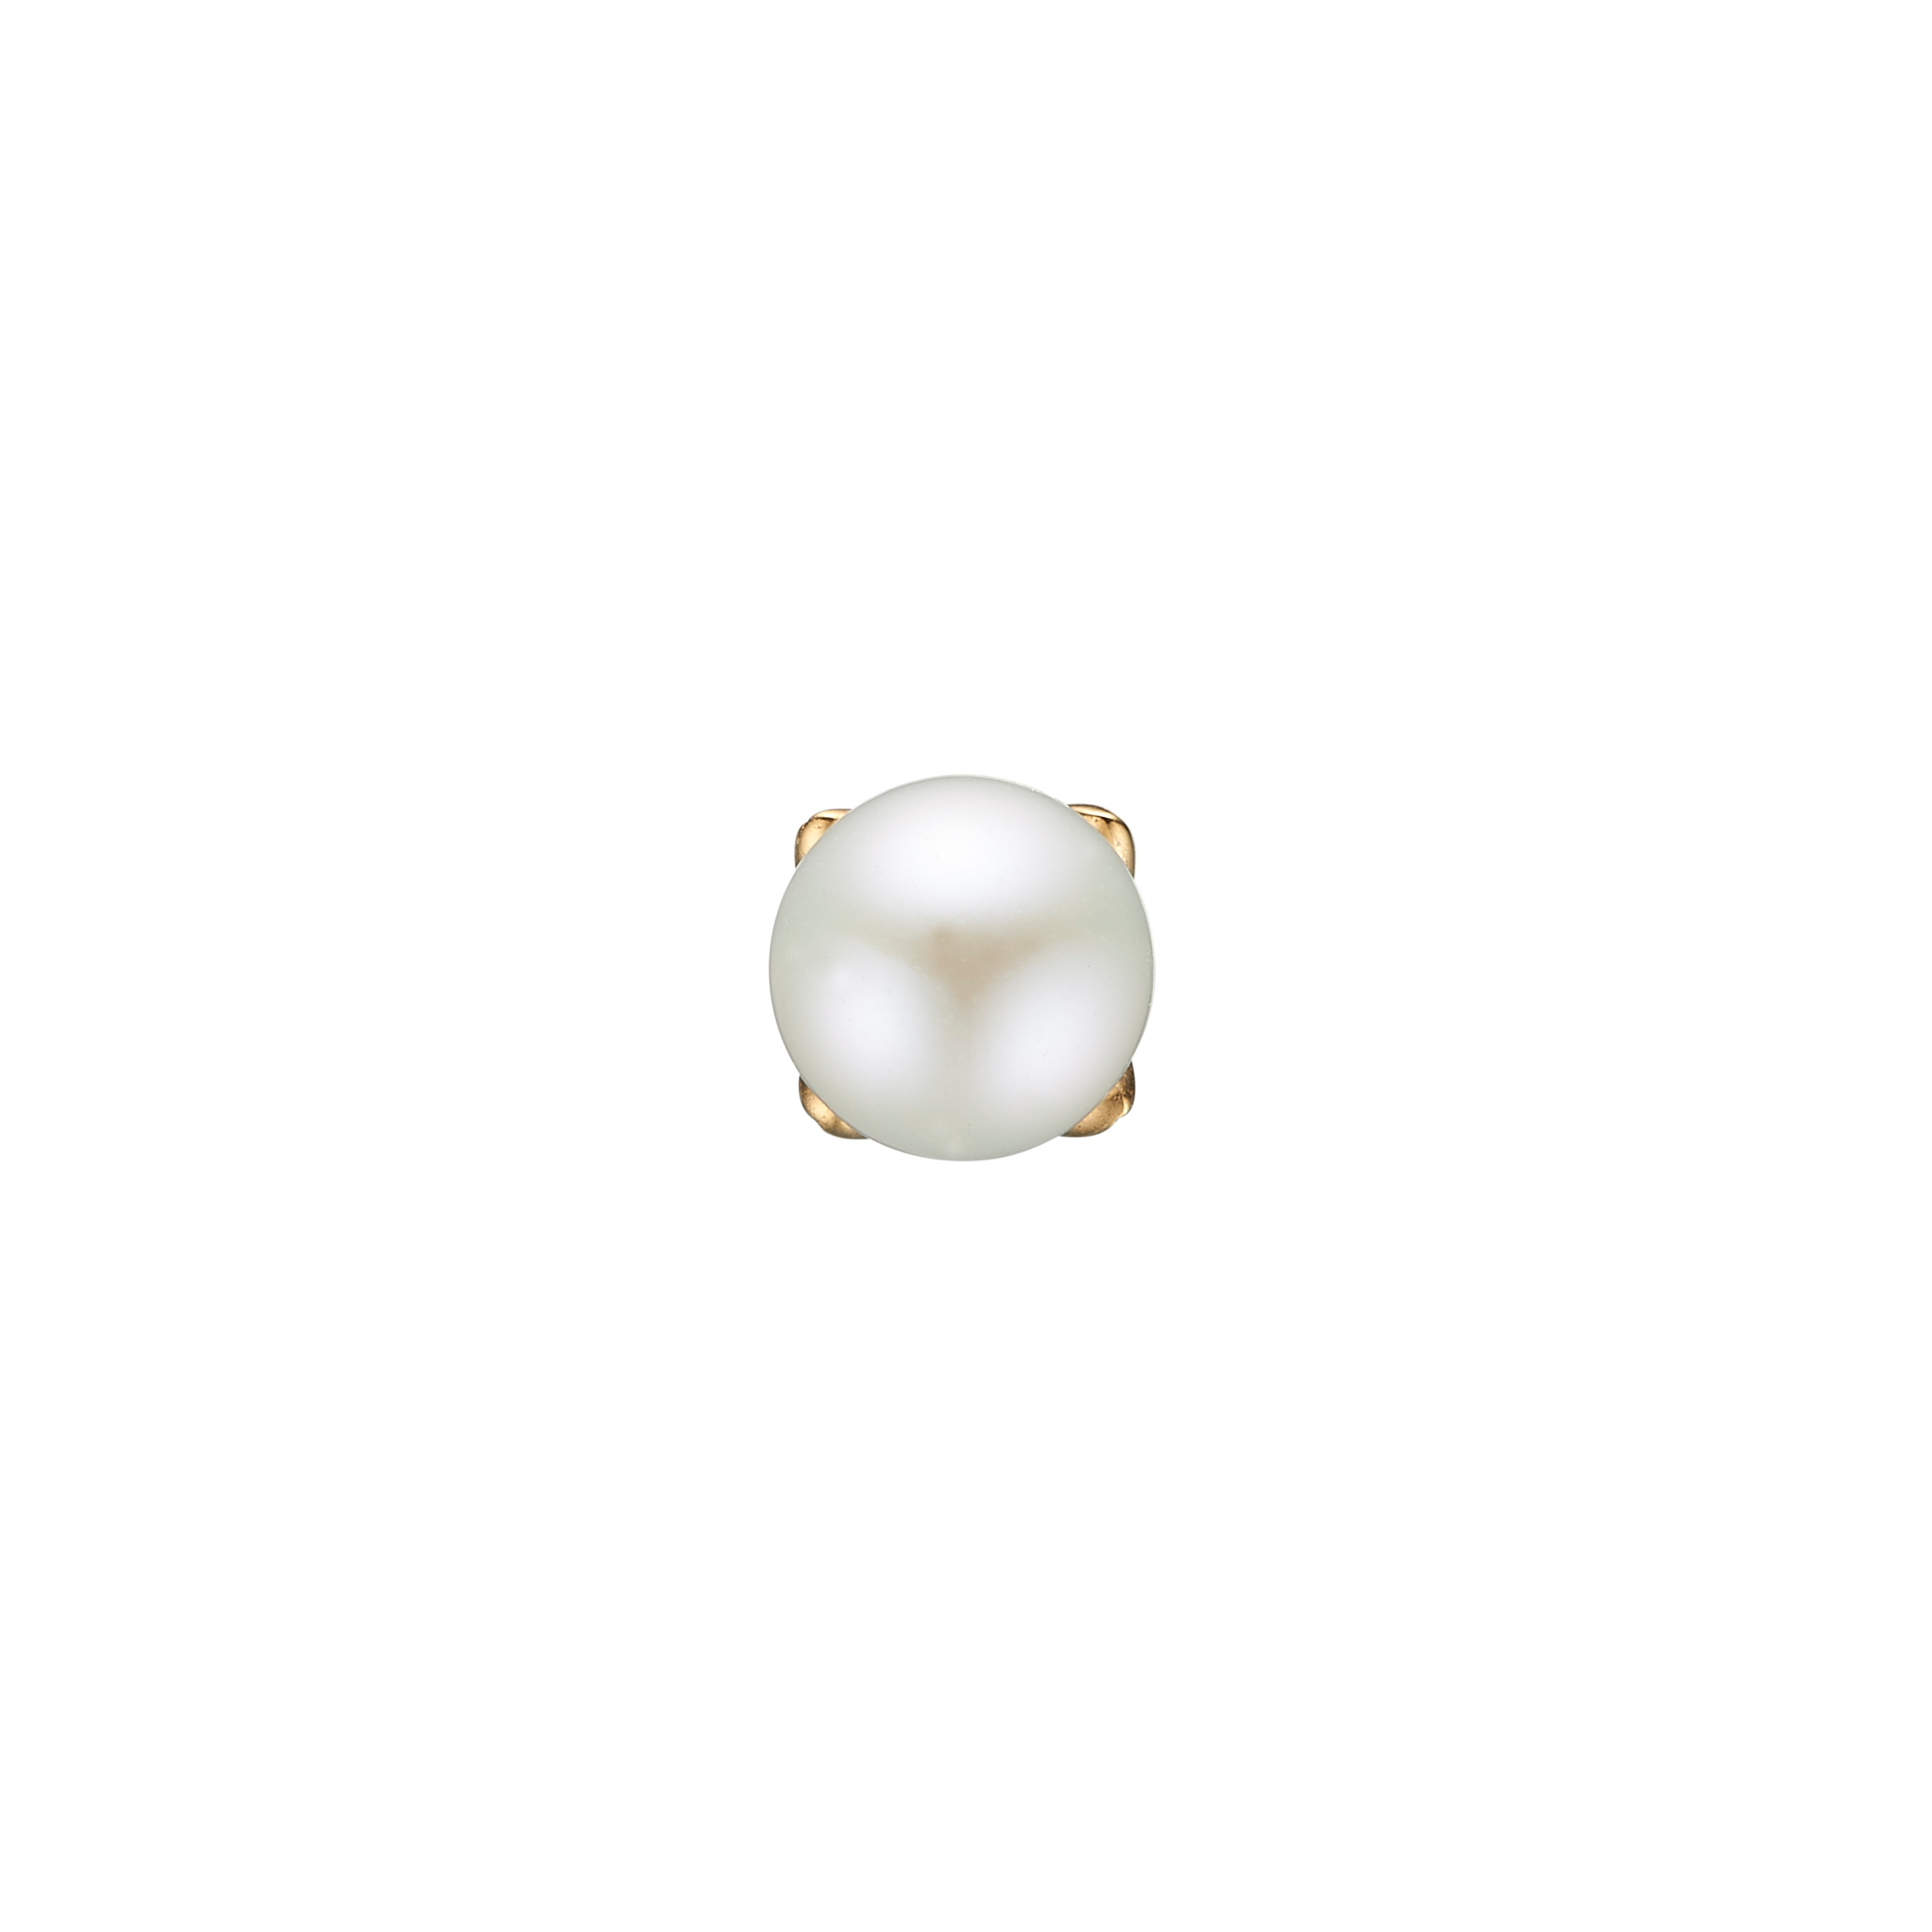 CHRISTINA Pearls - 671-G21